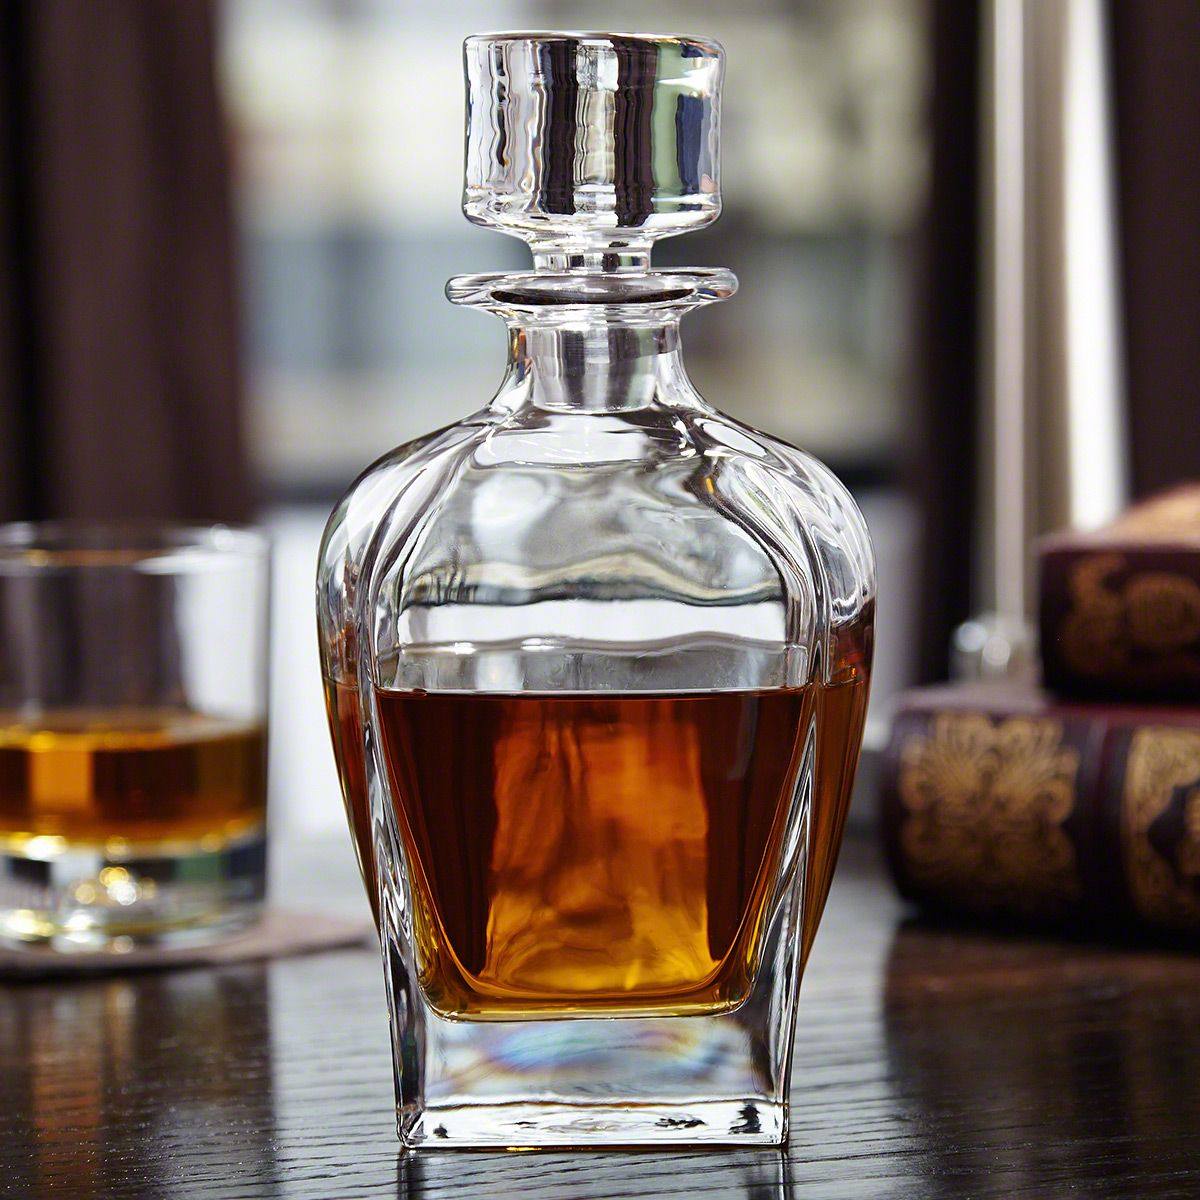 Draper Glass Liquor Decanter